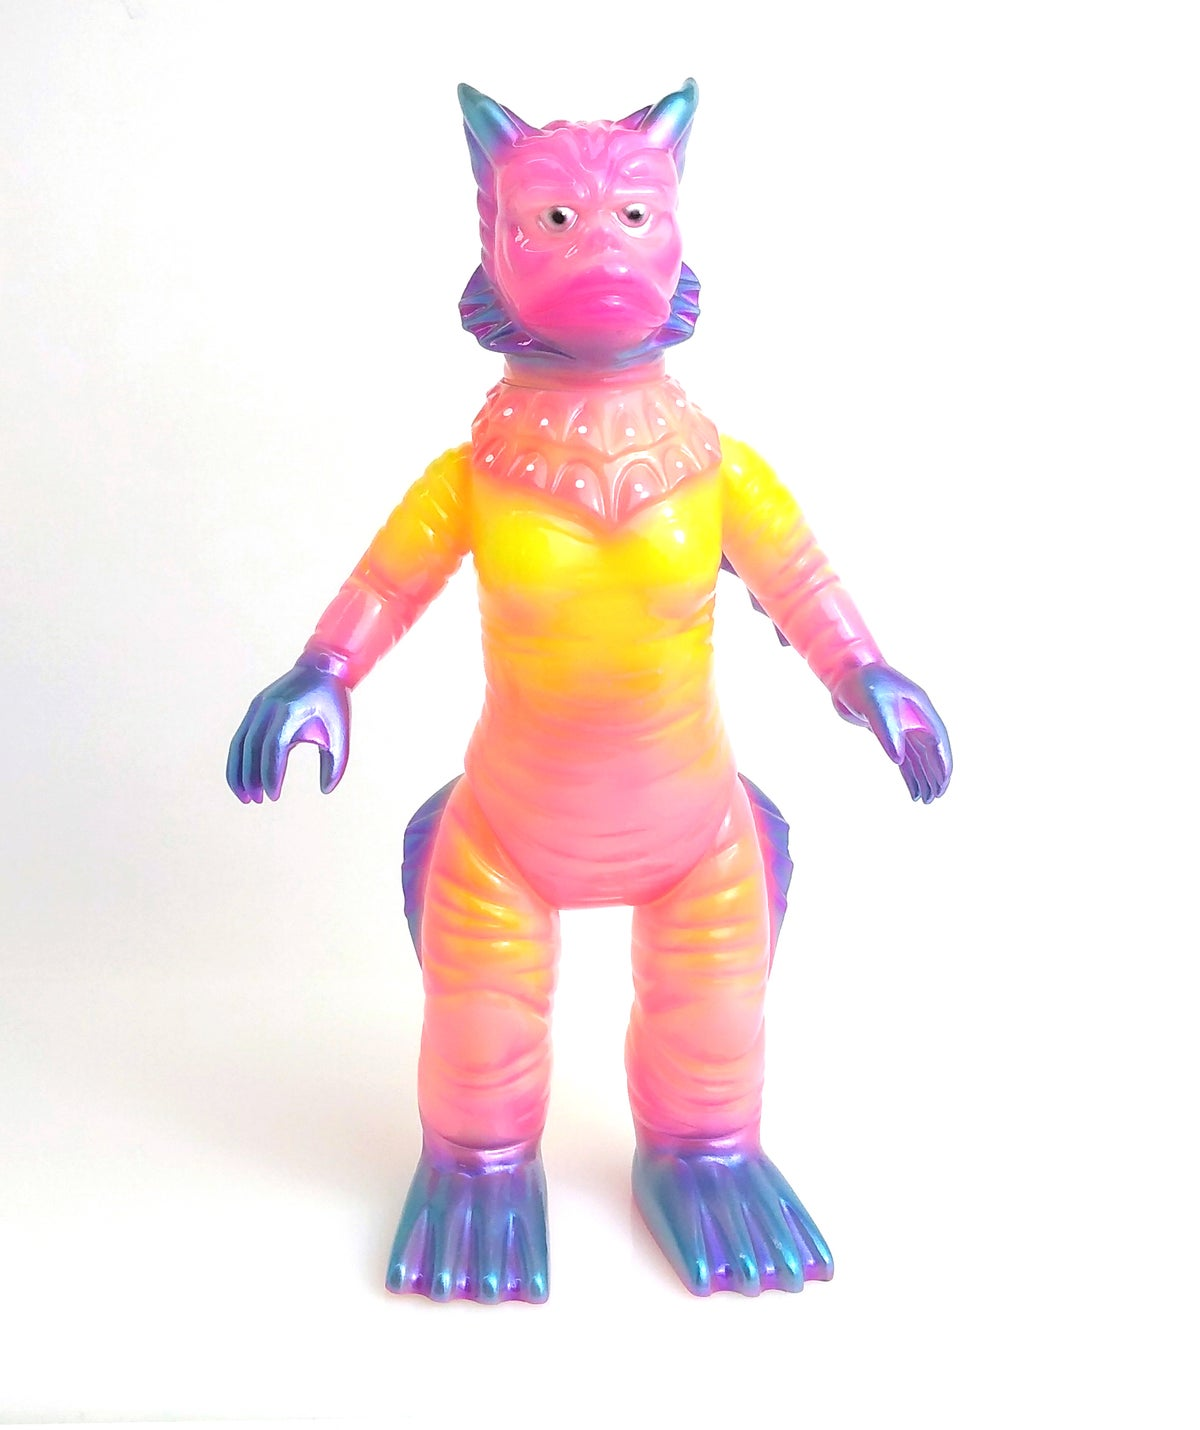 Image of M1go GID Ragon Neon One Off custom